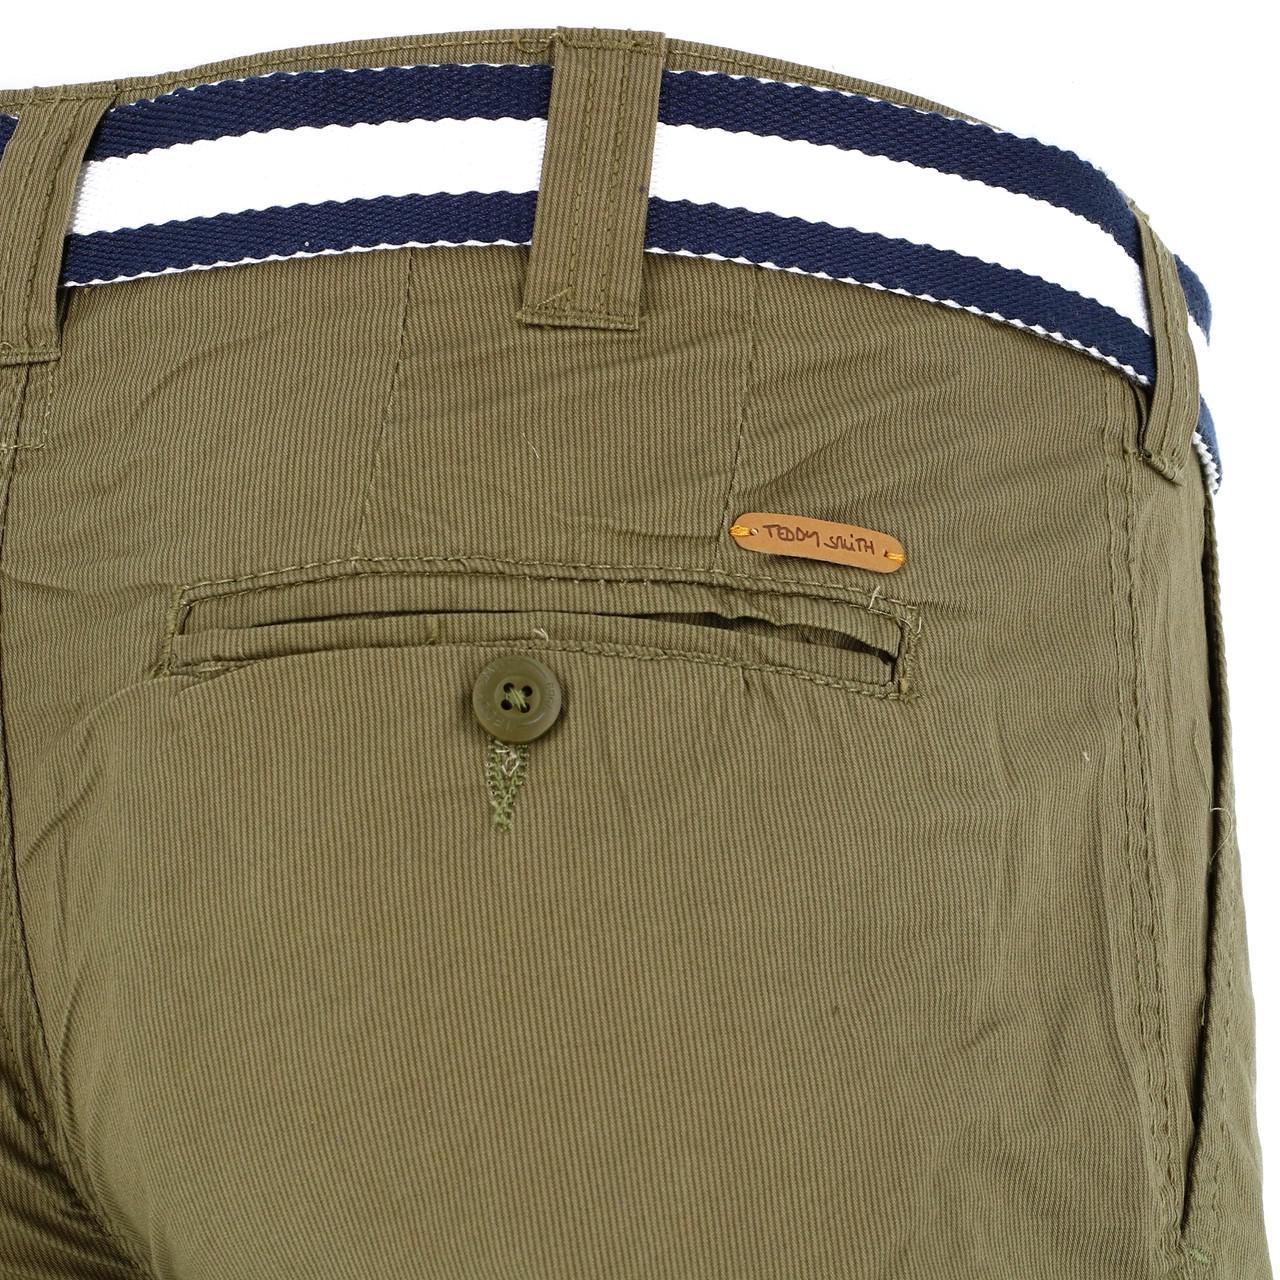 Bermuda-Shorts-Teddy-smith-Sytro-Khaki-Shorts-Jr-Green-18199-New thumbnail 3